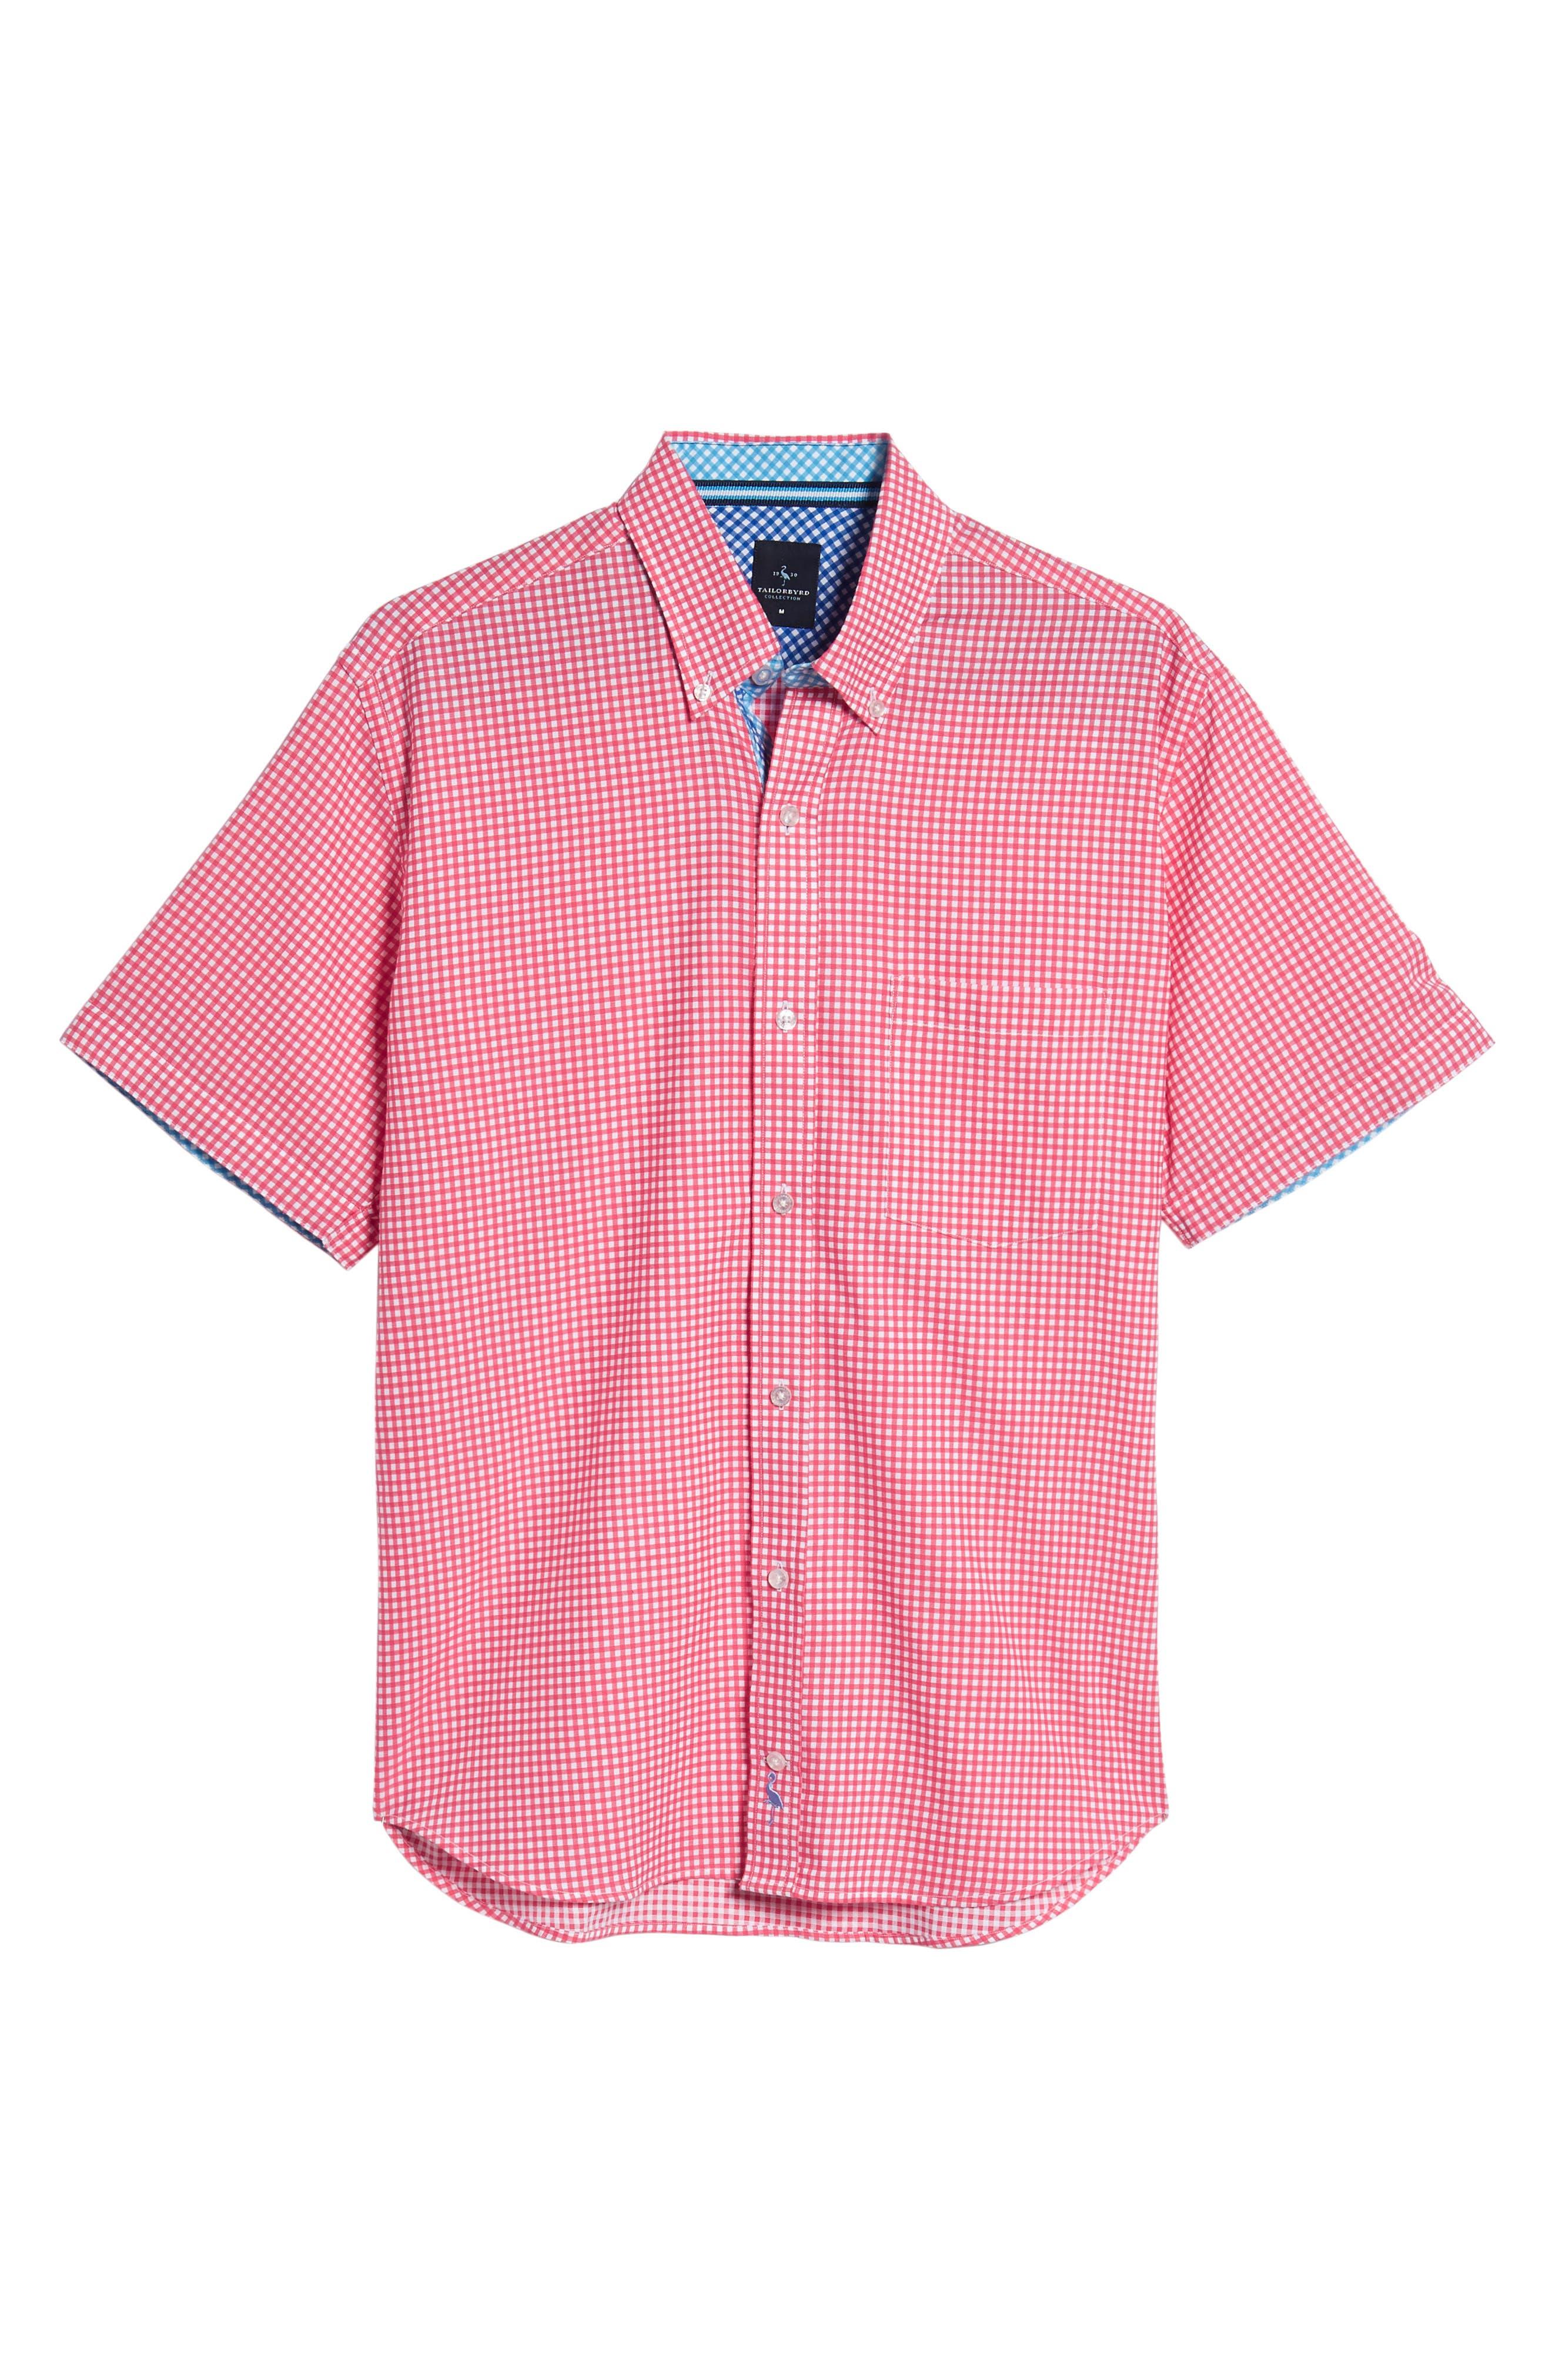 Aden Regular Fit Sport Shirt,                             Alternate thumbnail 6, color,                             Coral